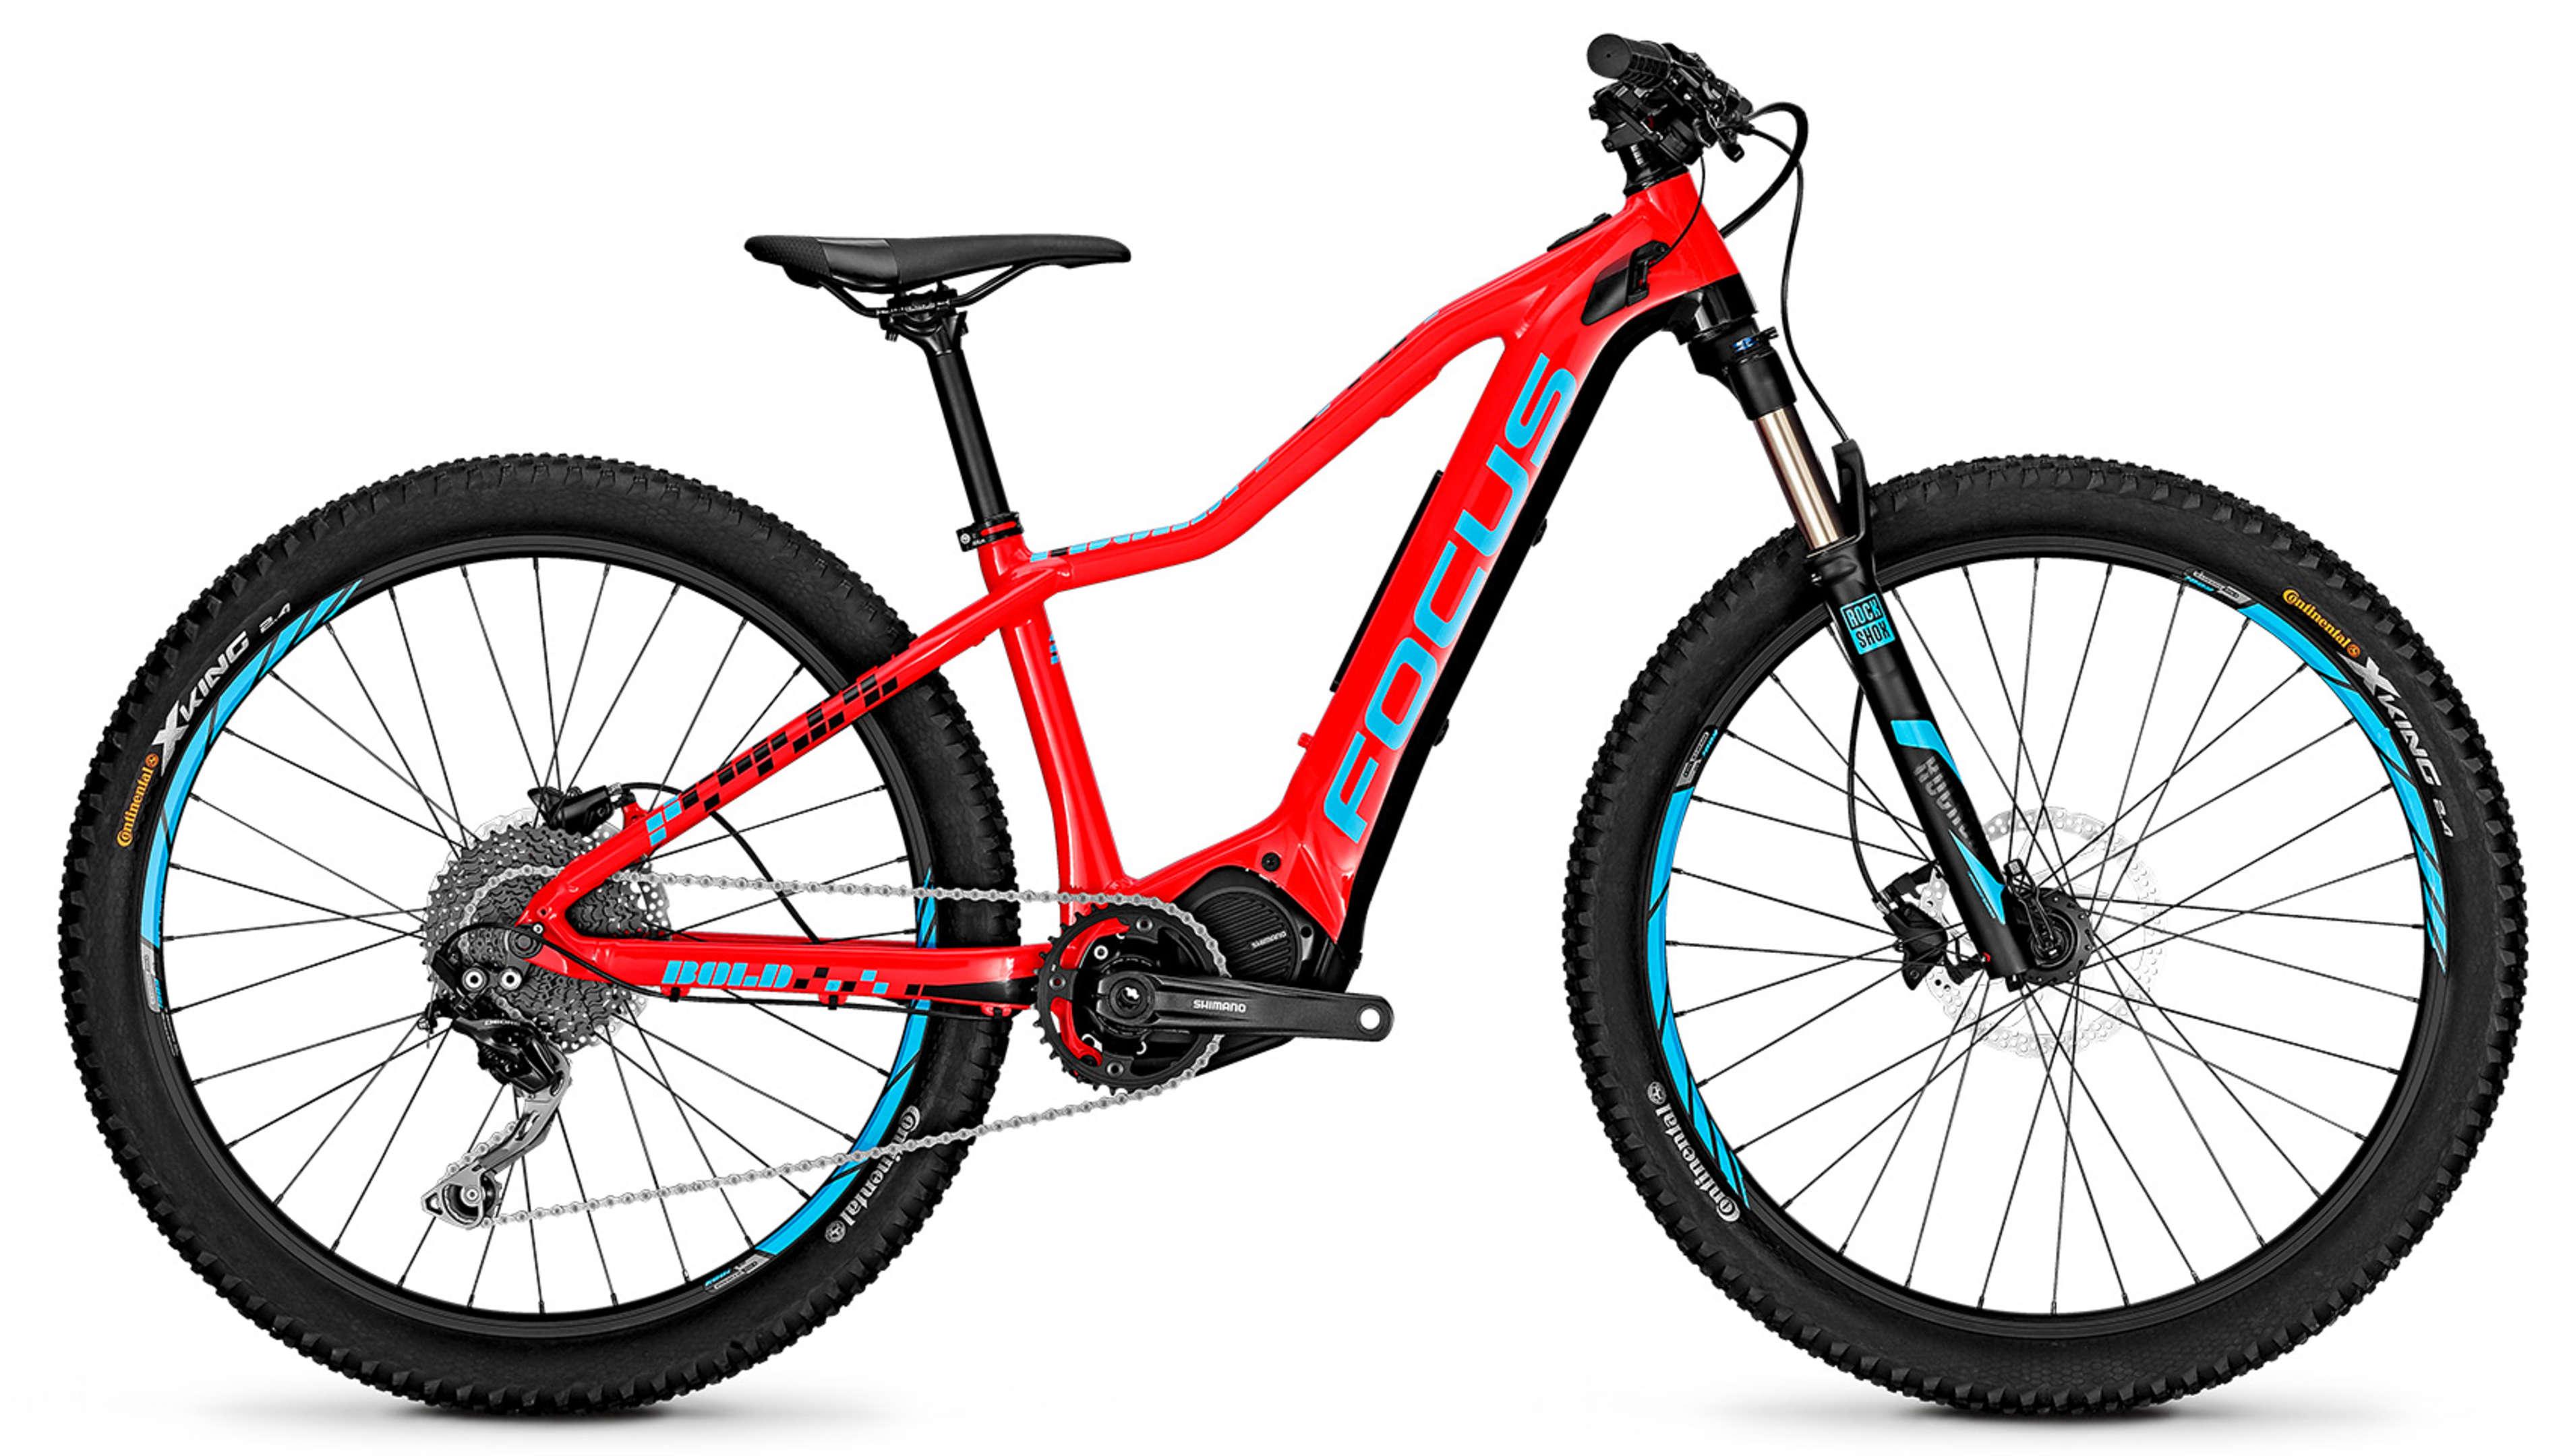 focus e mtb bold2 junior 10 5ah 36v eurorad bikeleasingeurorad bikeleasing. Black Bedroom Furniture Sets. Home Design Ideas